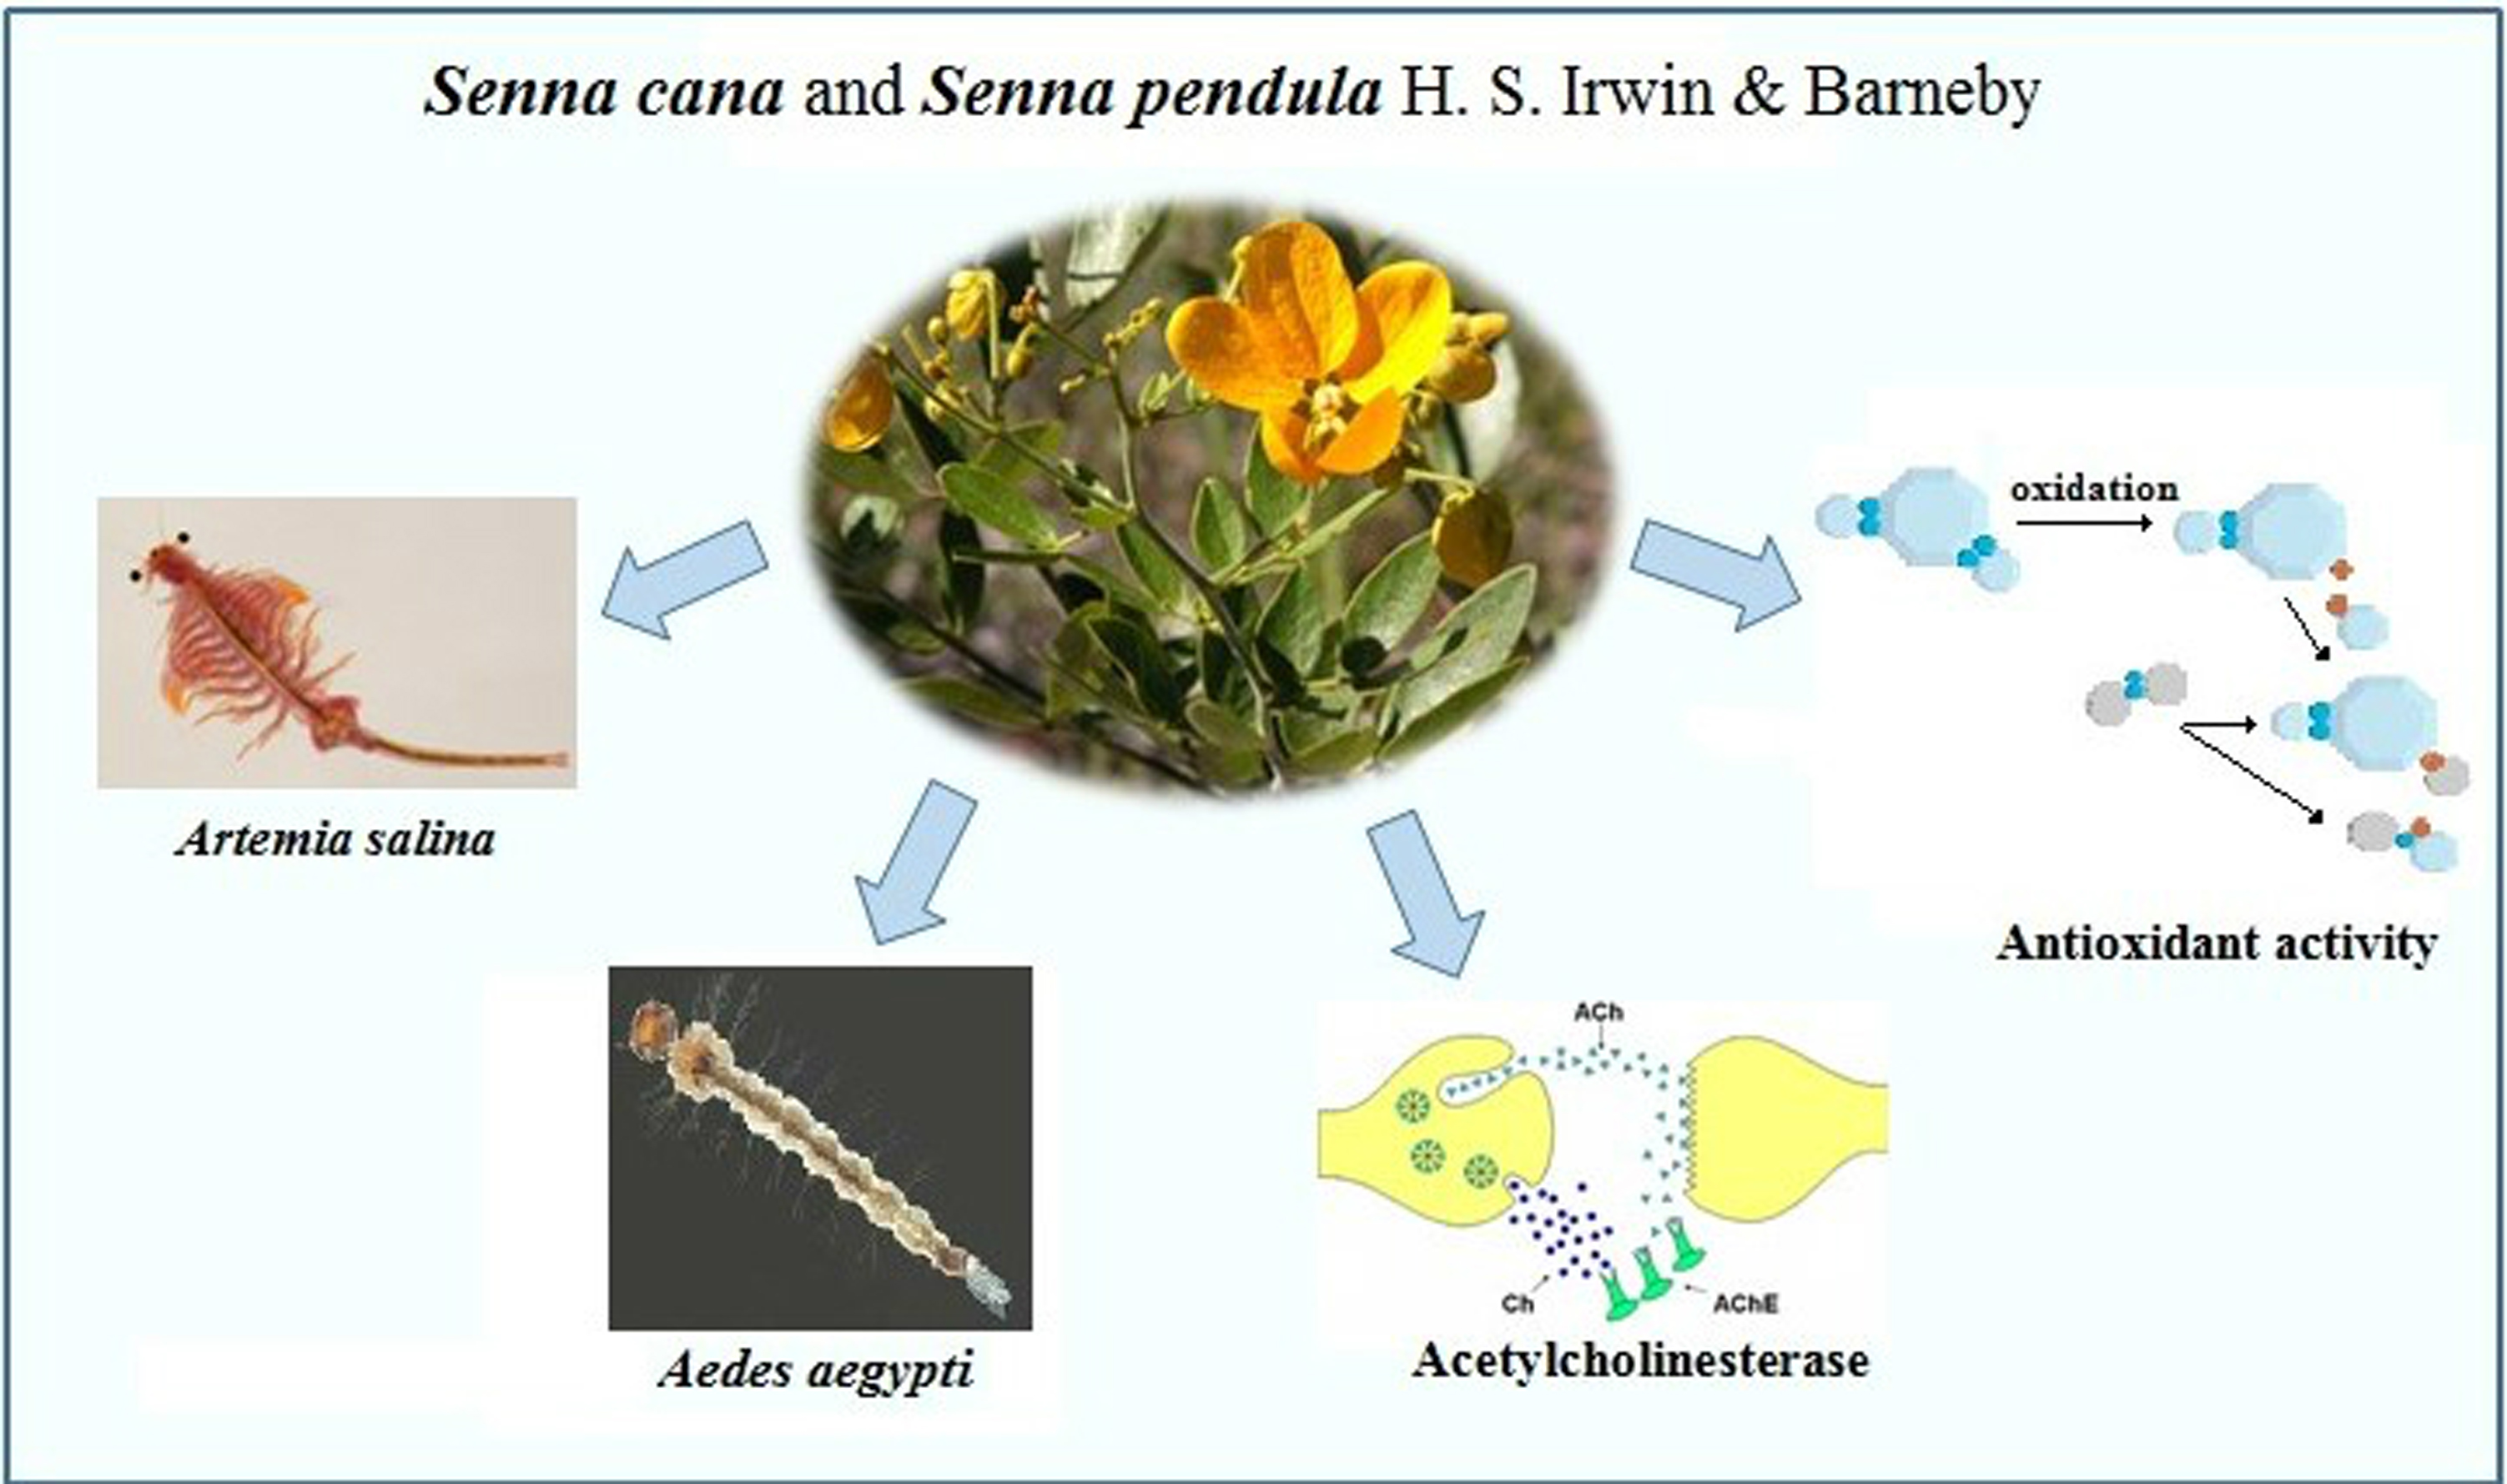 Bioactivity and Toxicity of Senna cana and Senna pendula